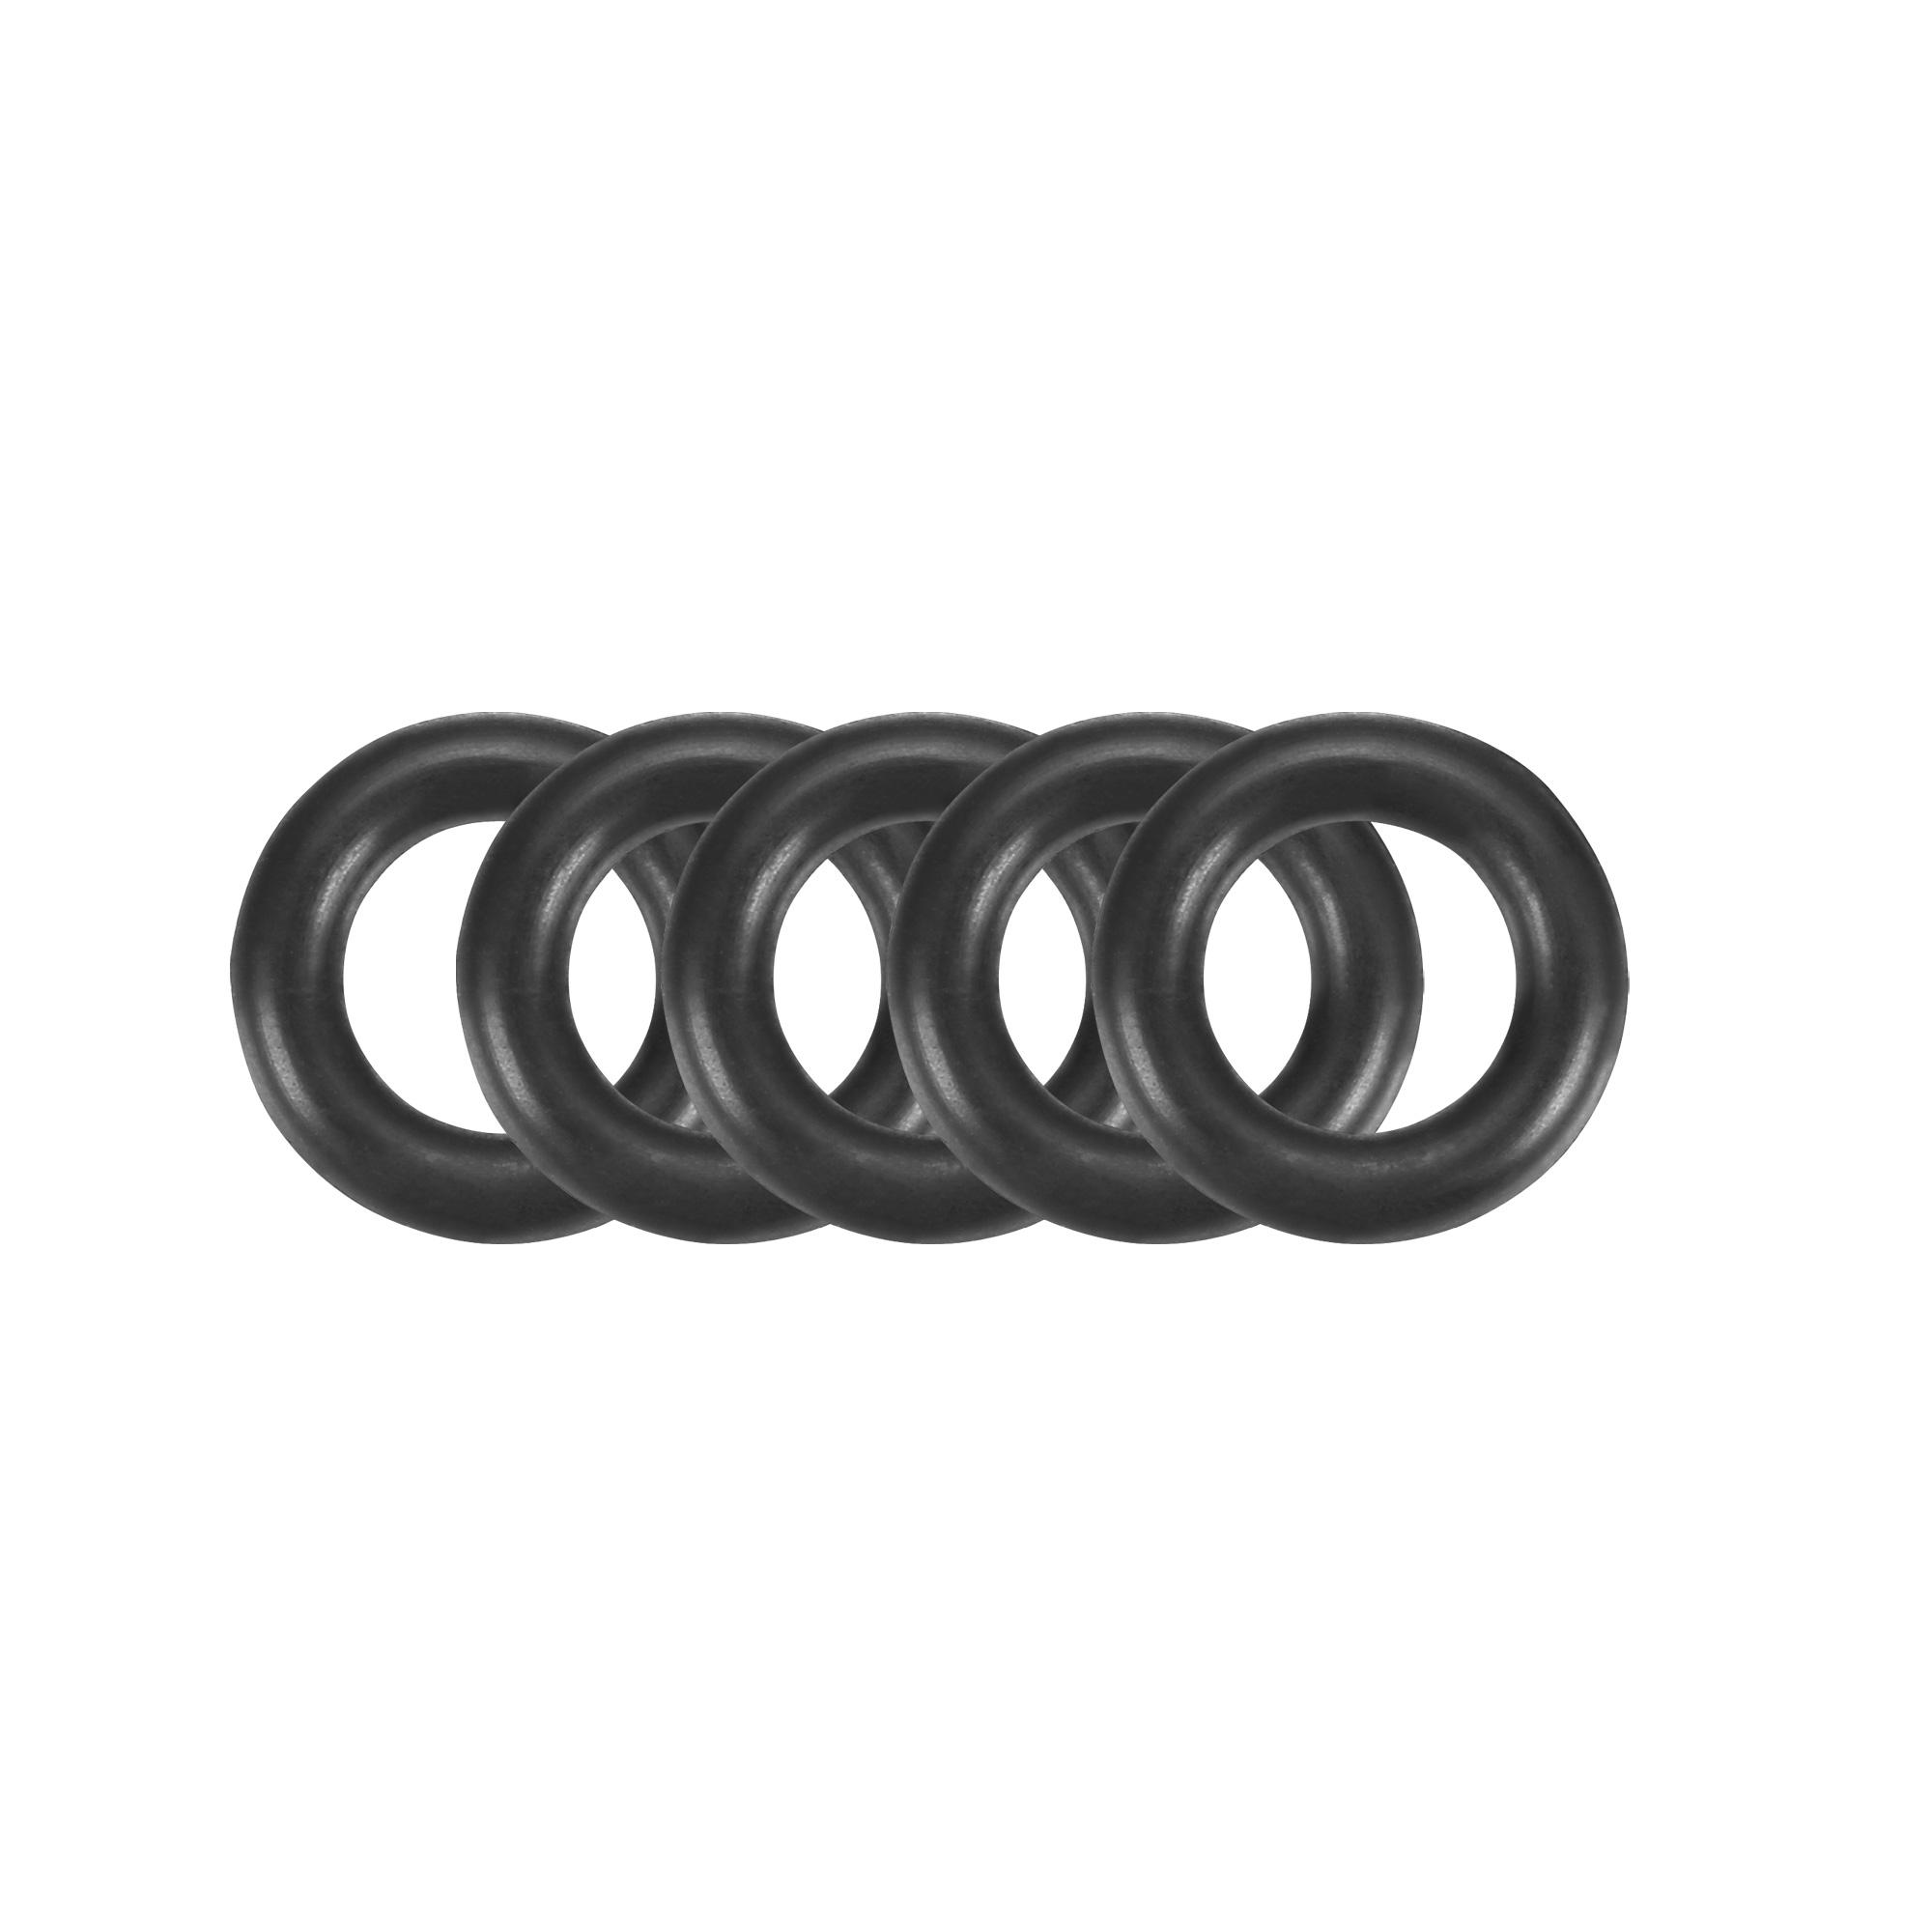 50Pcs Black 9 x 2mm Industrial Flexible Rubber O Ring Oil Sealing Grommets